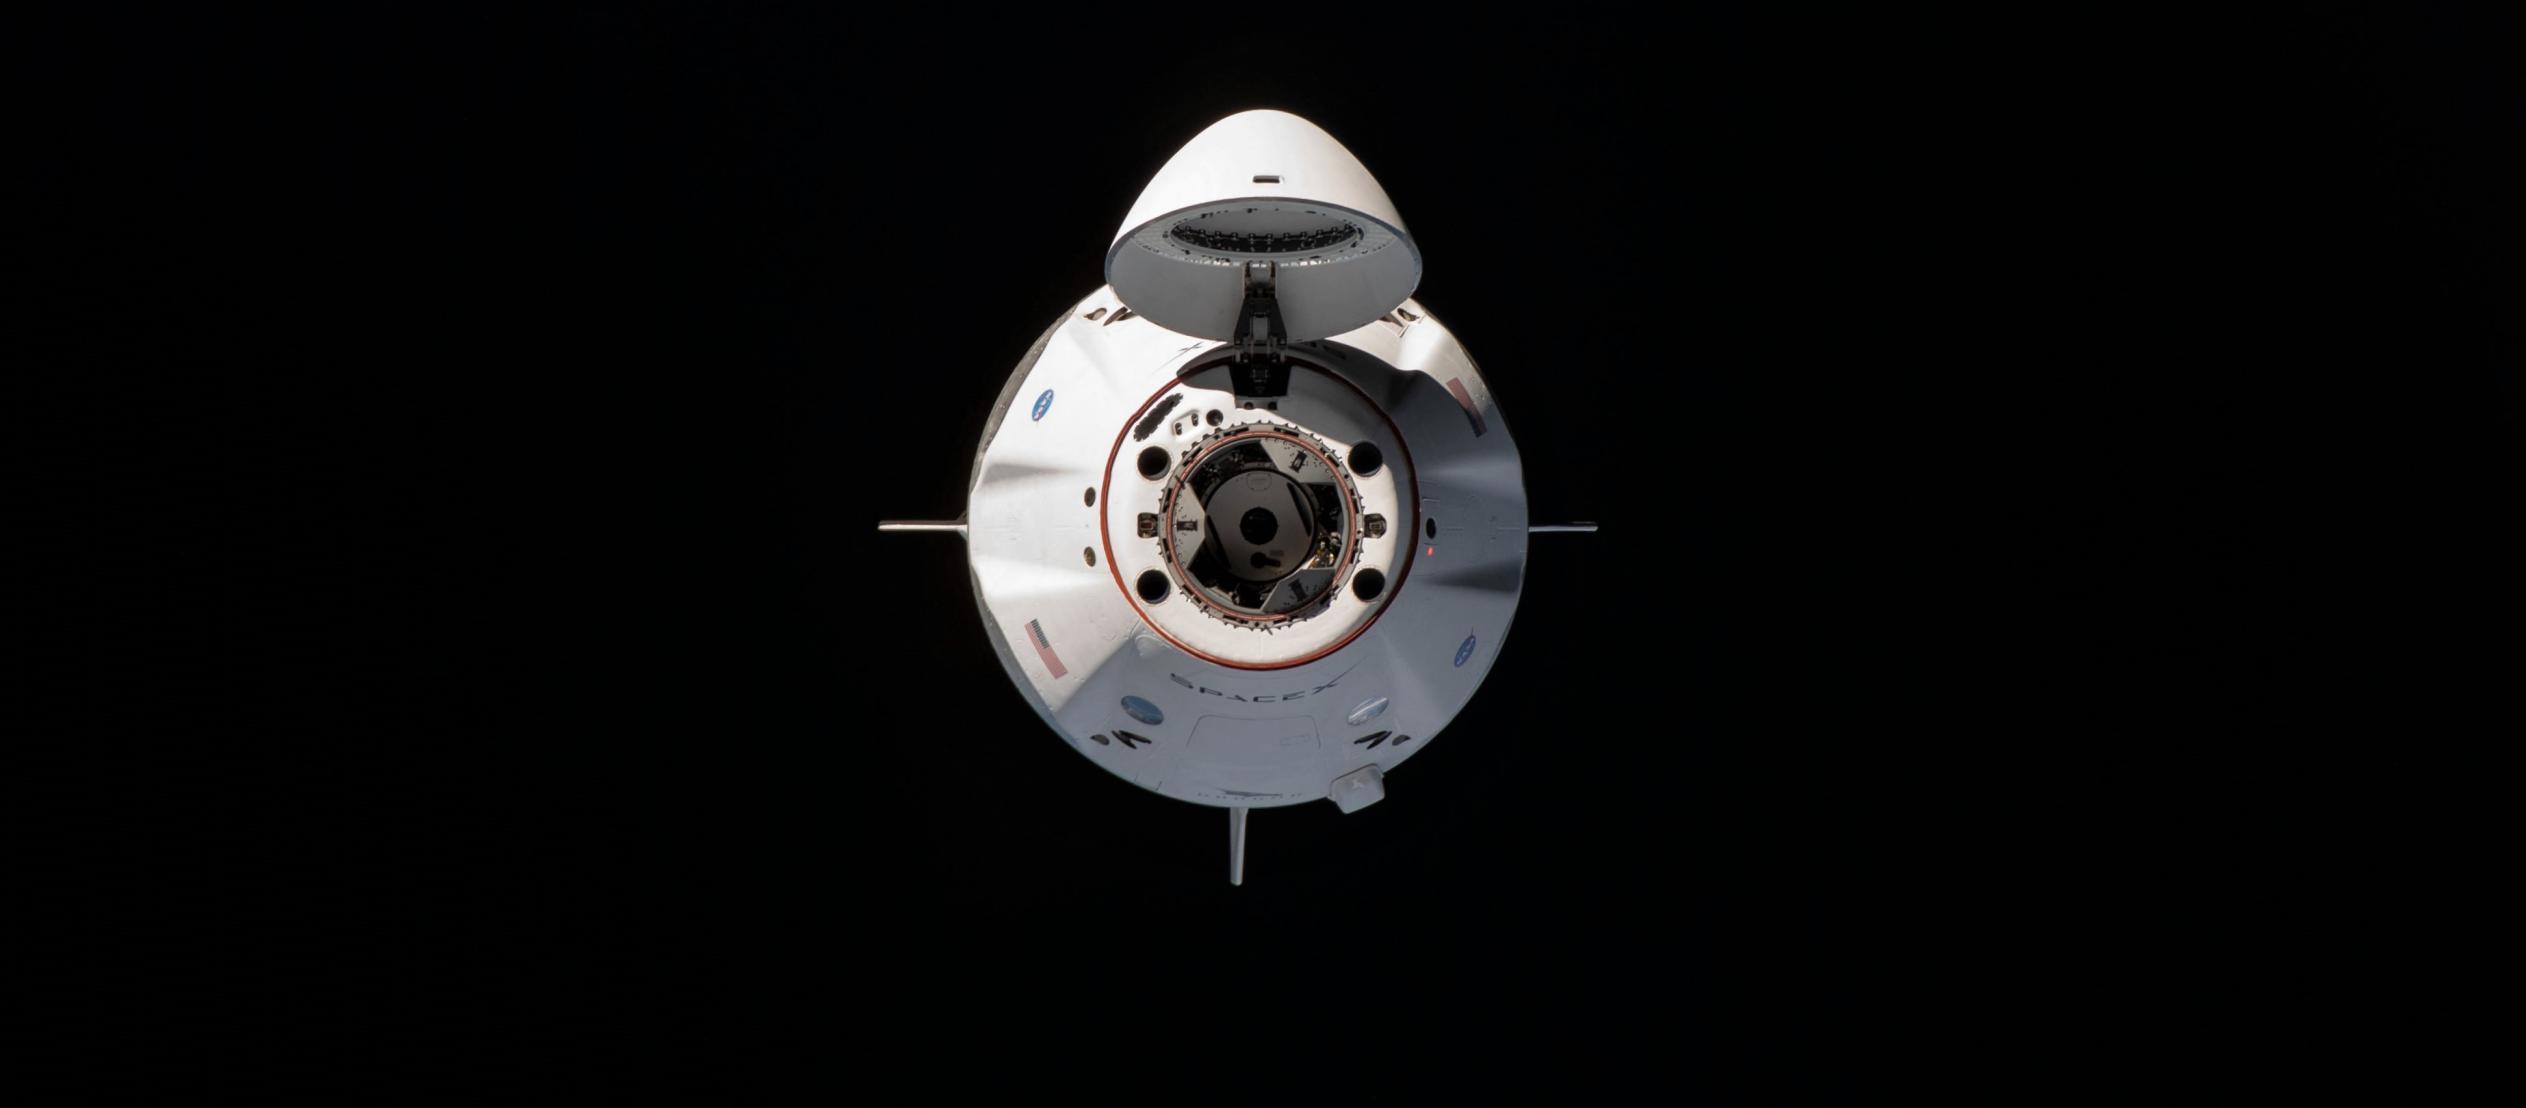 Crew Dragon Crew-1 orbital ops 111620 (NASA) ISS approach 1 crop 1 (c)